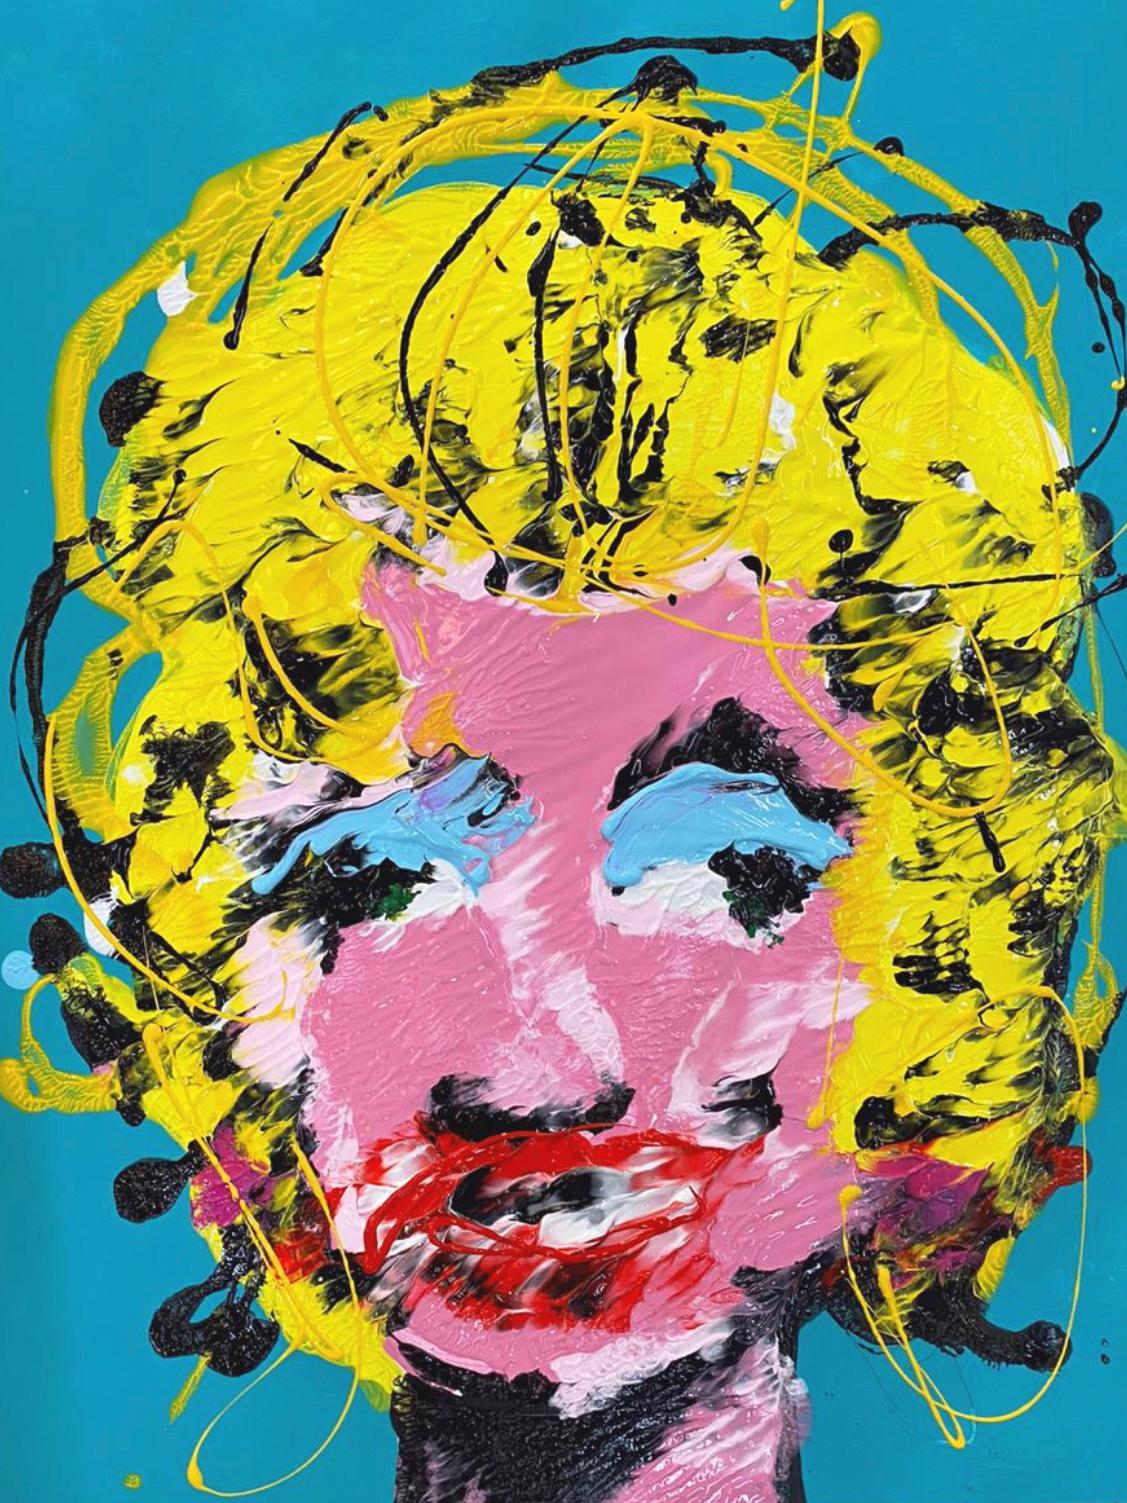 Defy Marilyn by John Paul Fauves